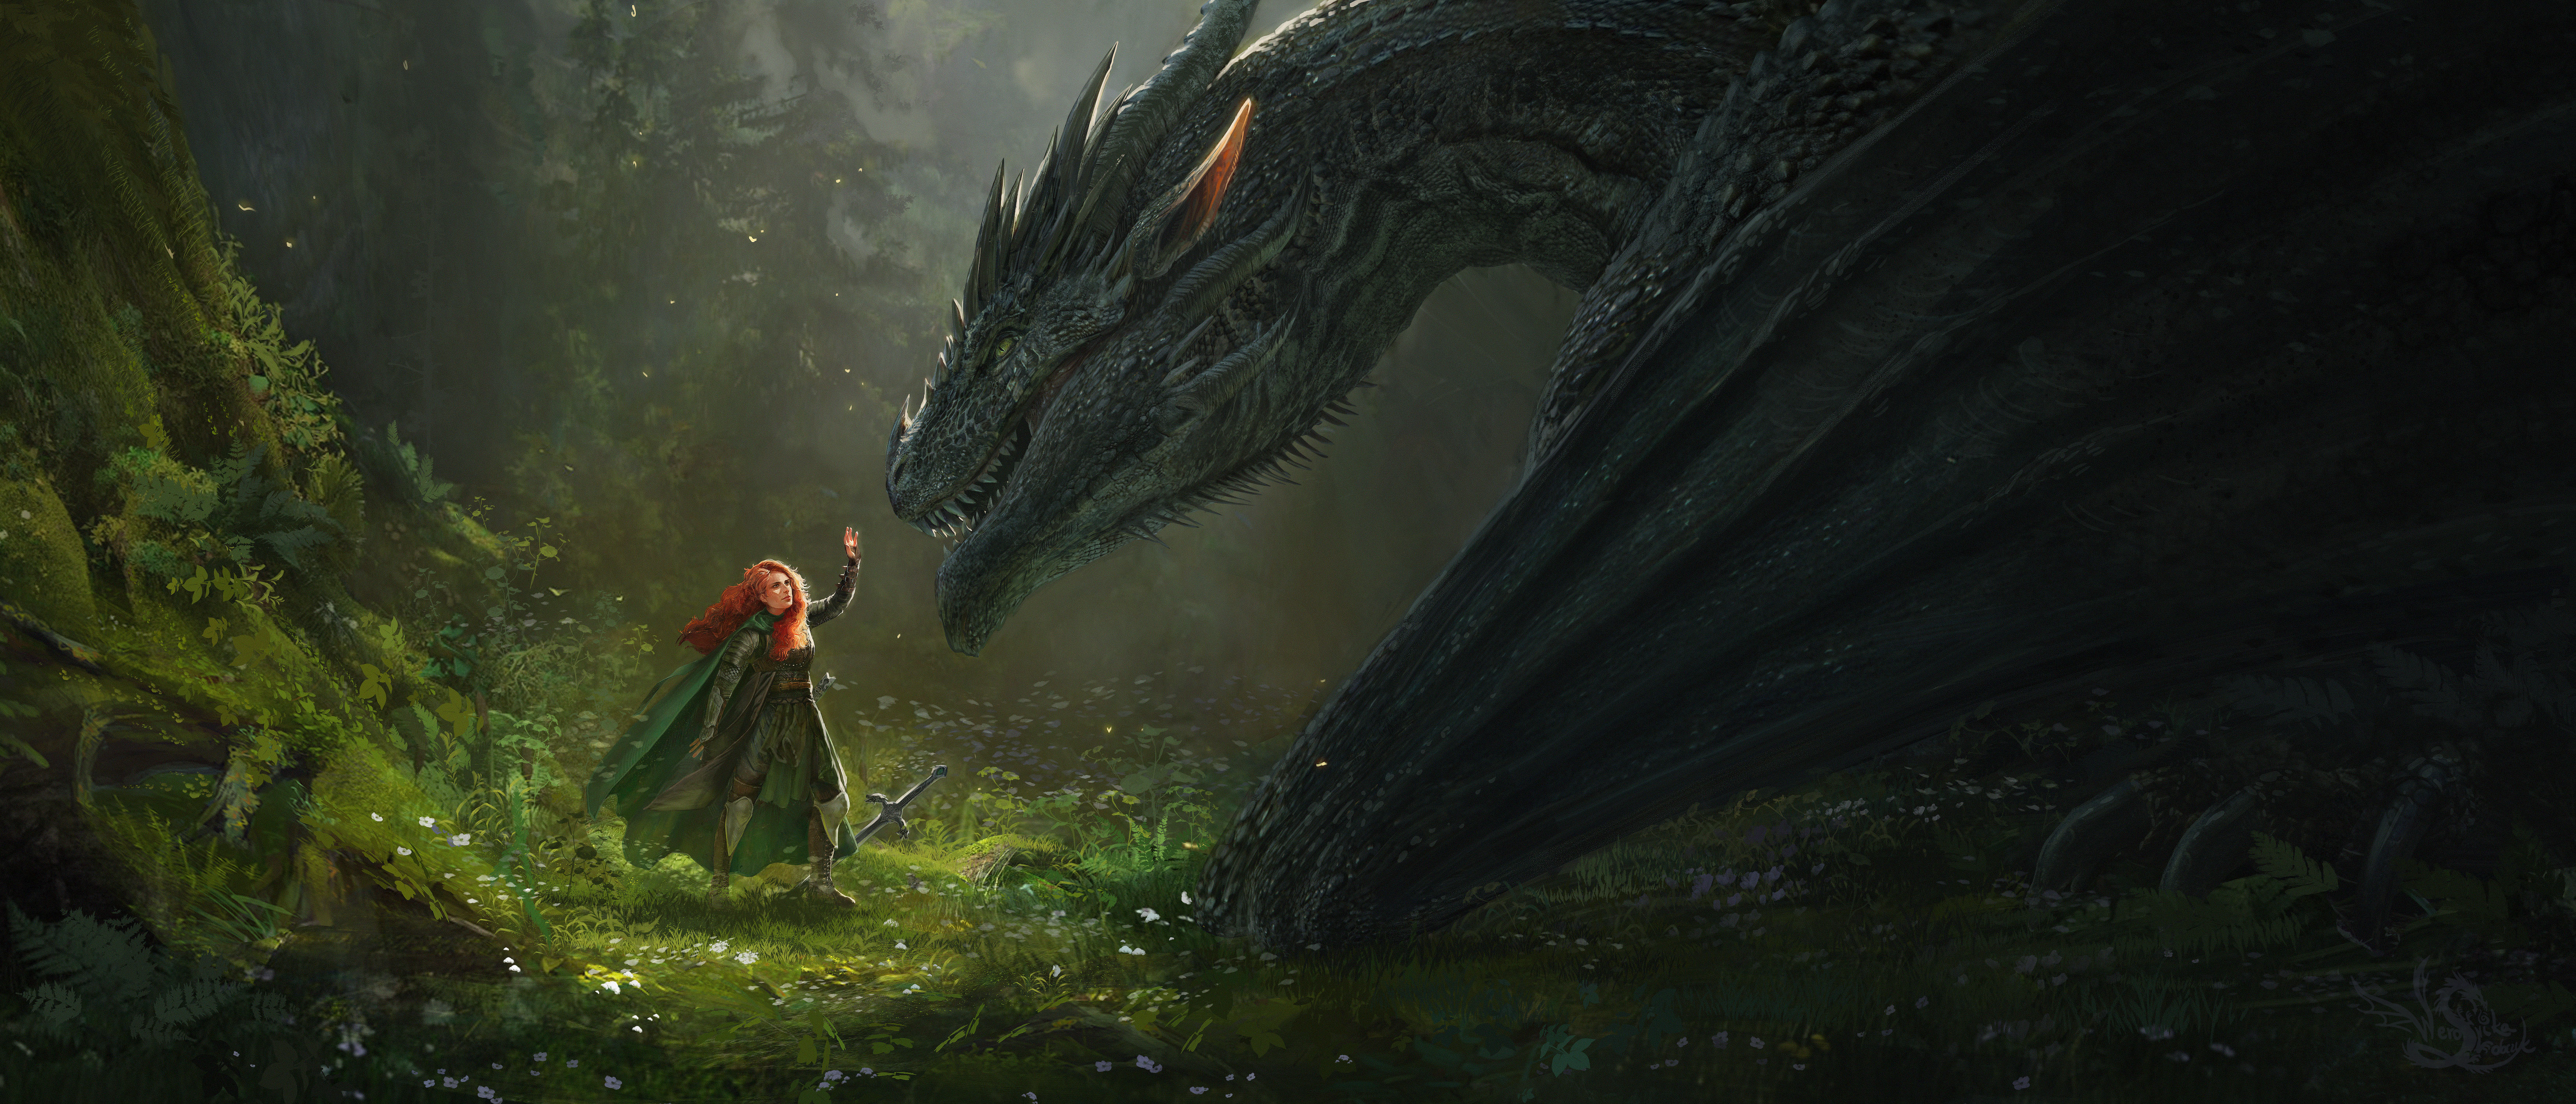 General 7000x3000 artwork fantasy art women redhead dragon creature fantasy girl